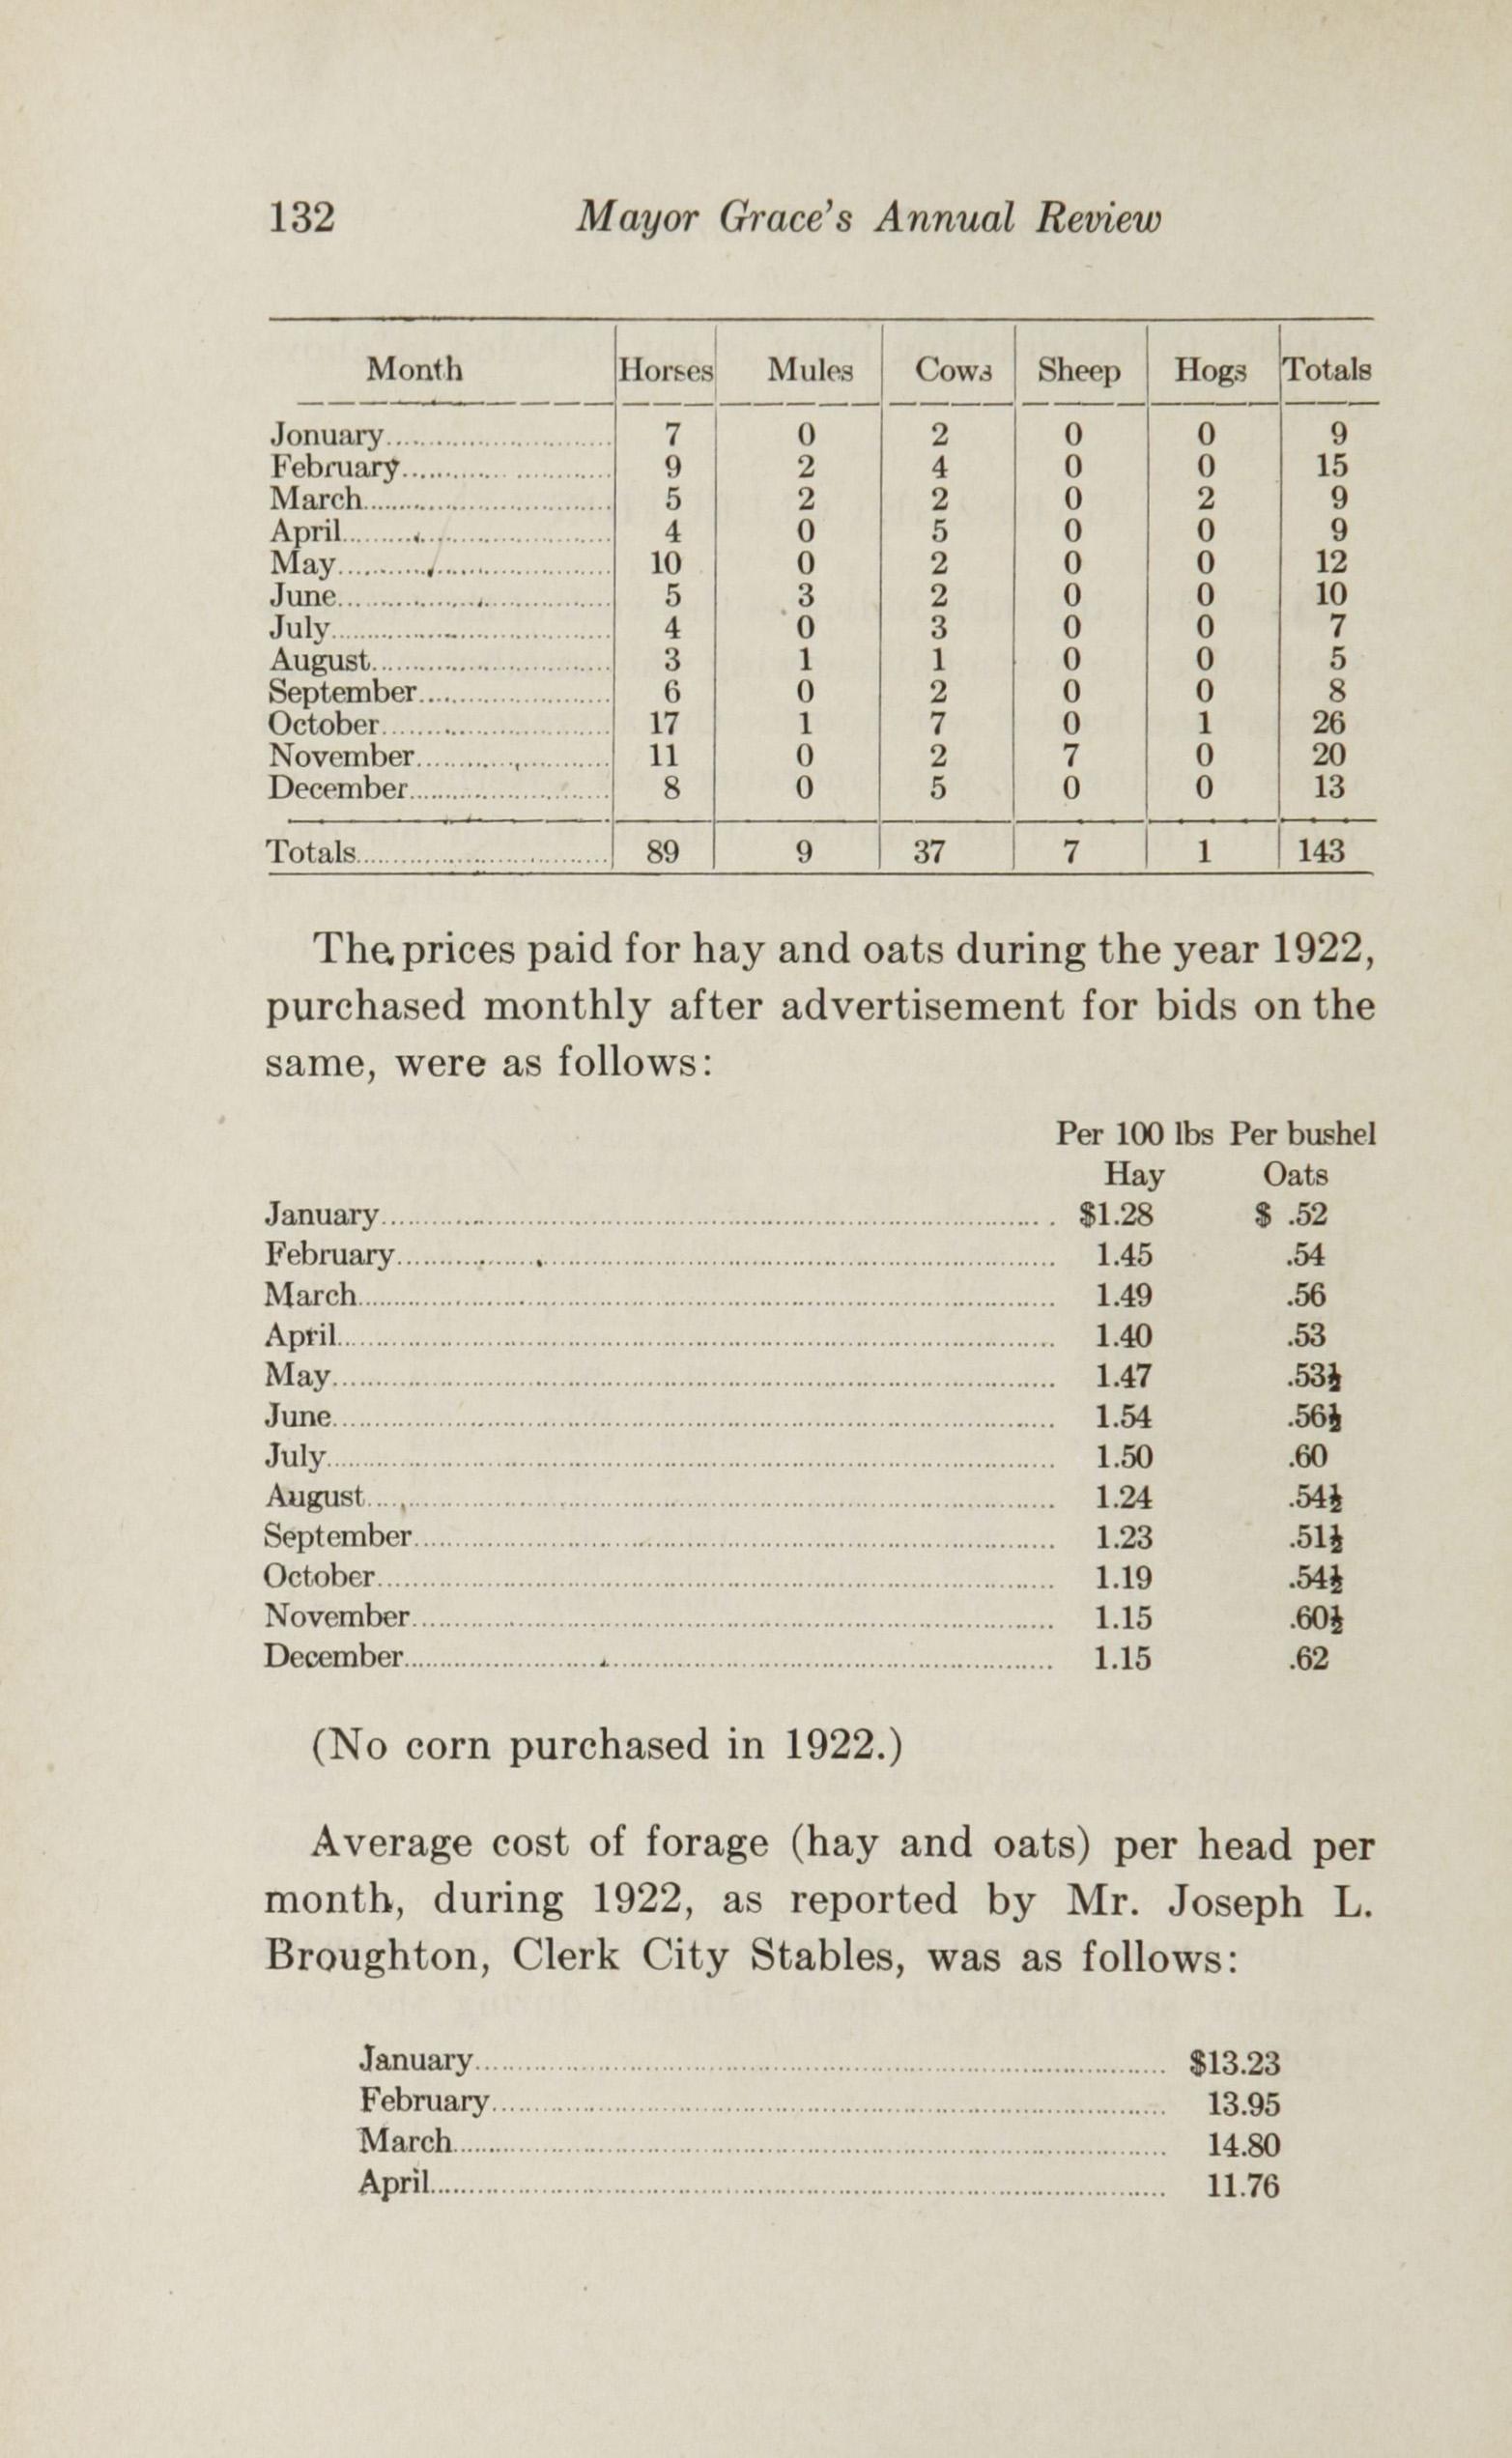 Charleston Yearbook, 1922, page 132